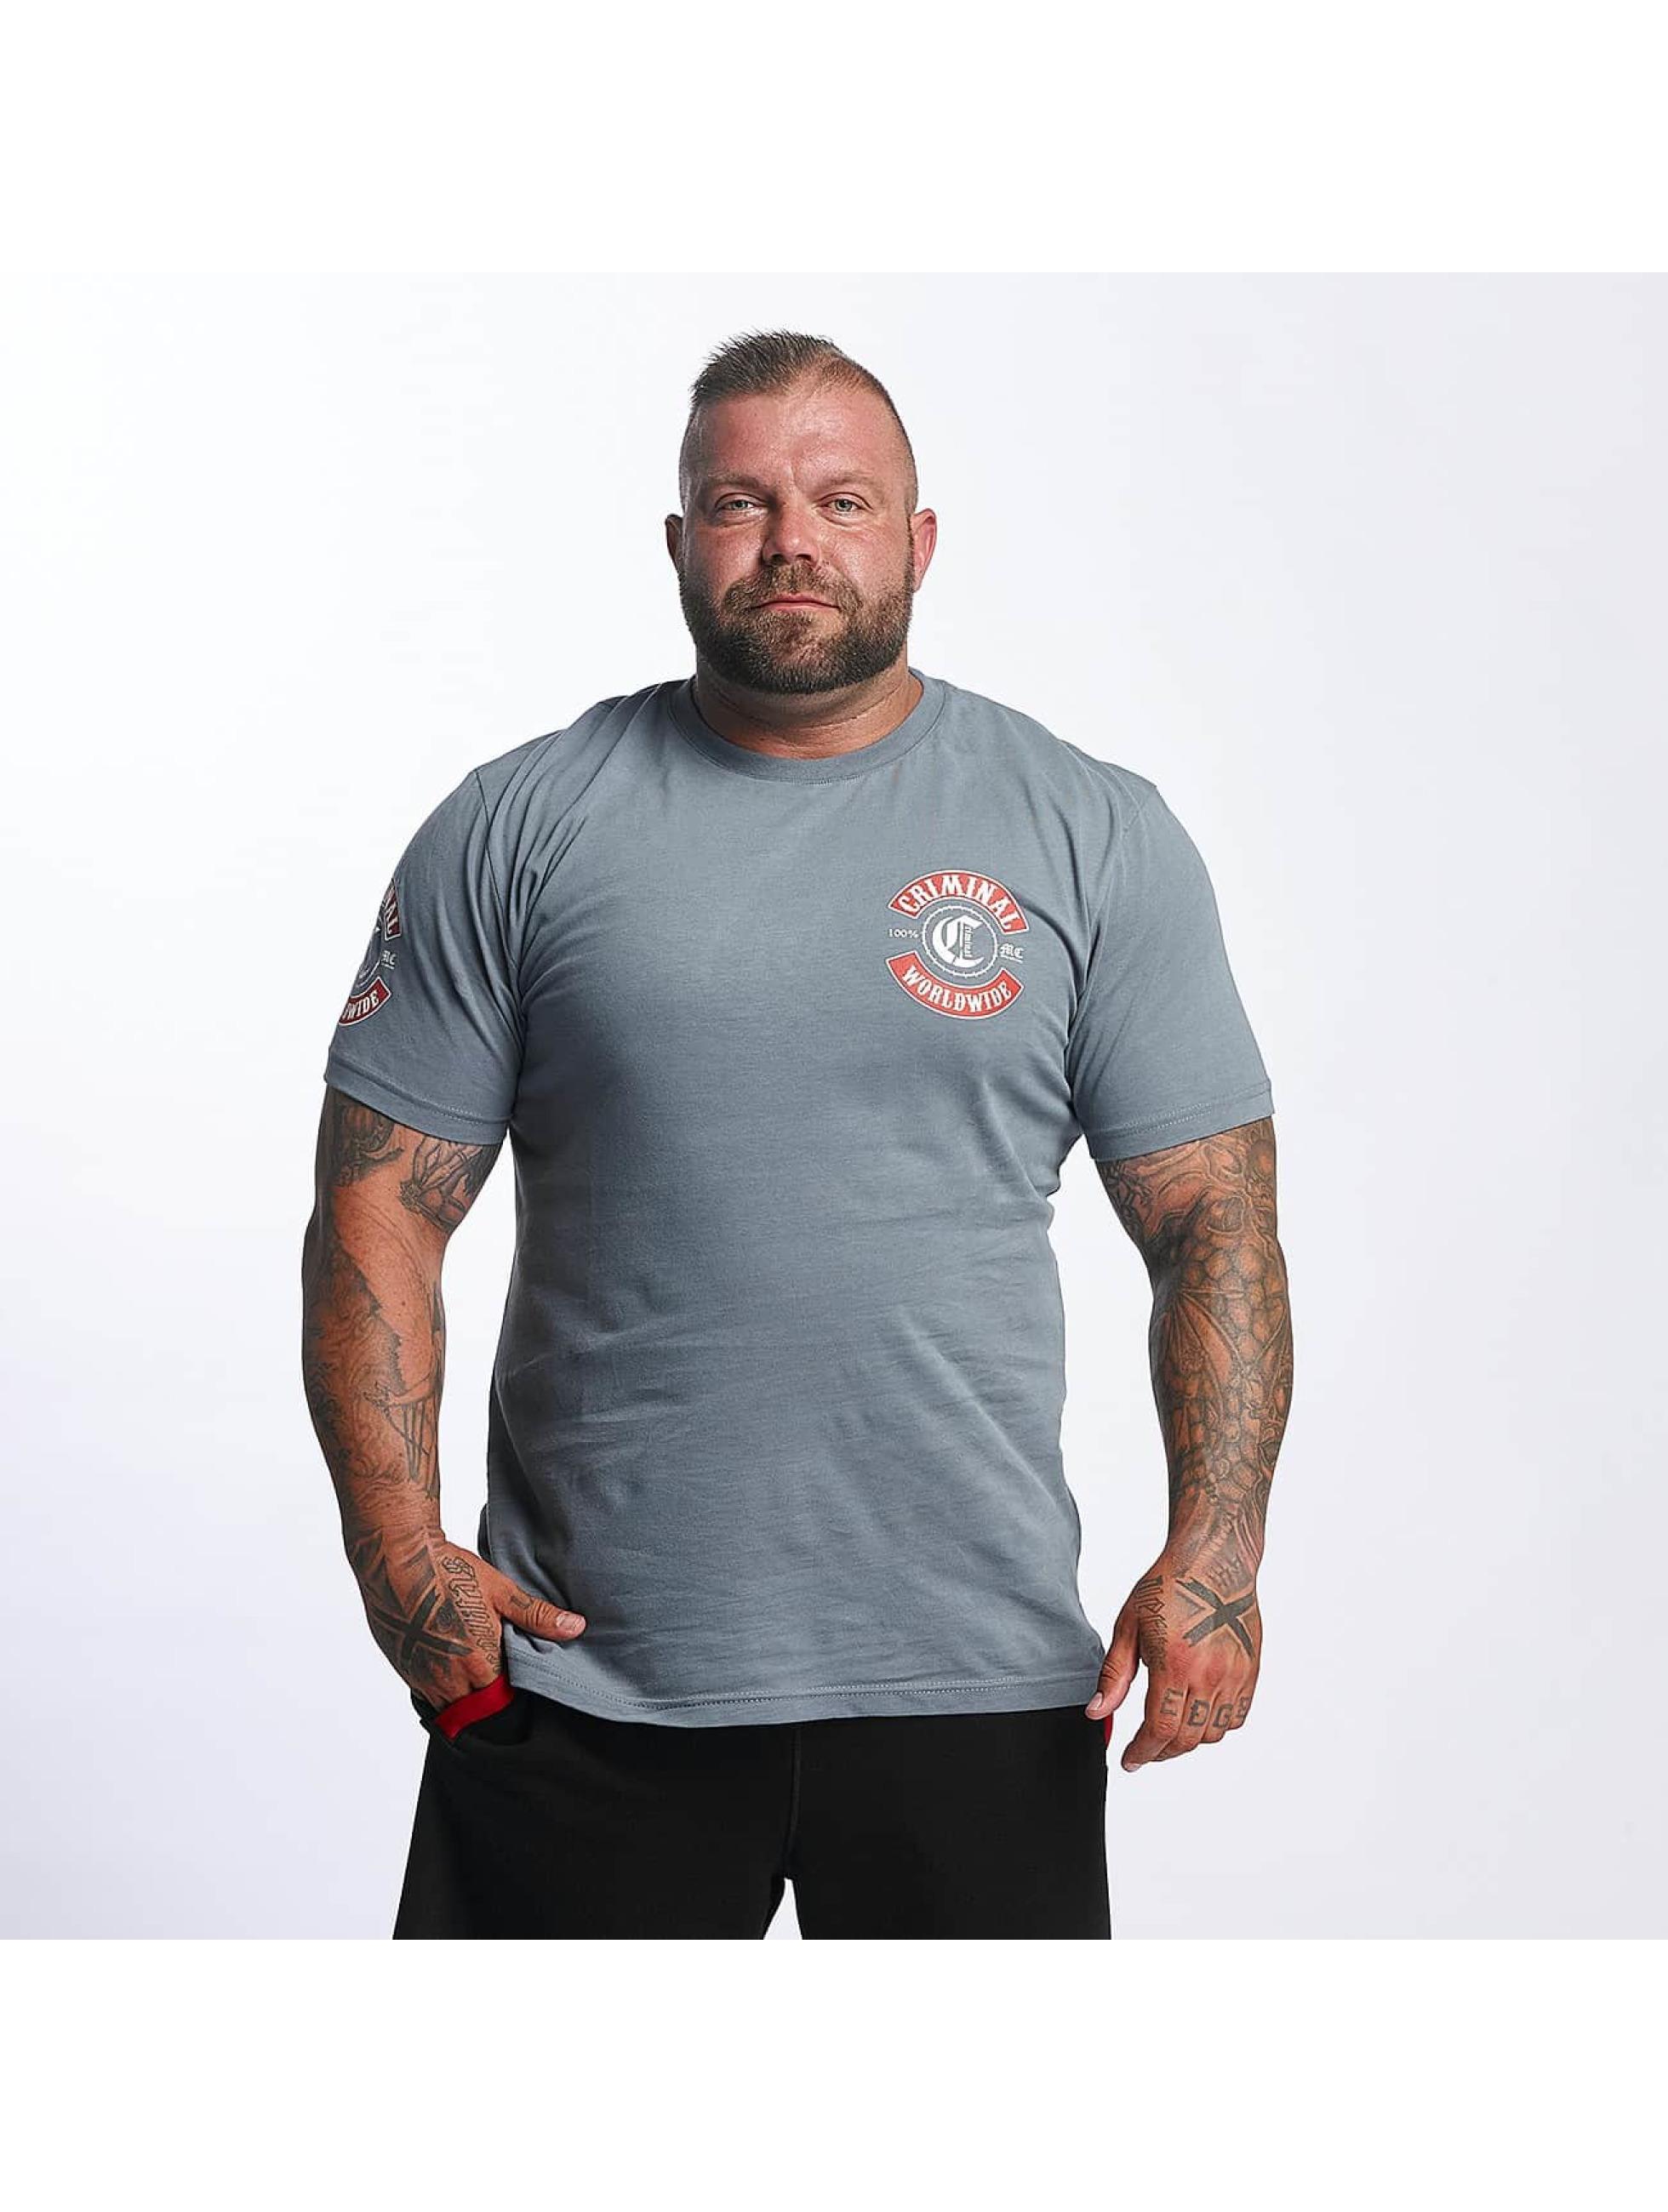 Mafia & Crime T-Shirt MC182 gray